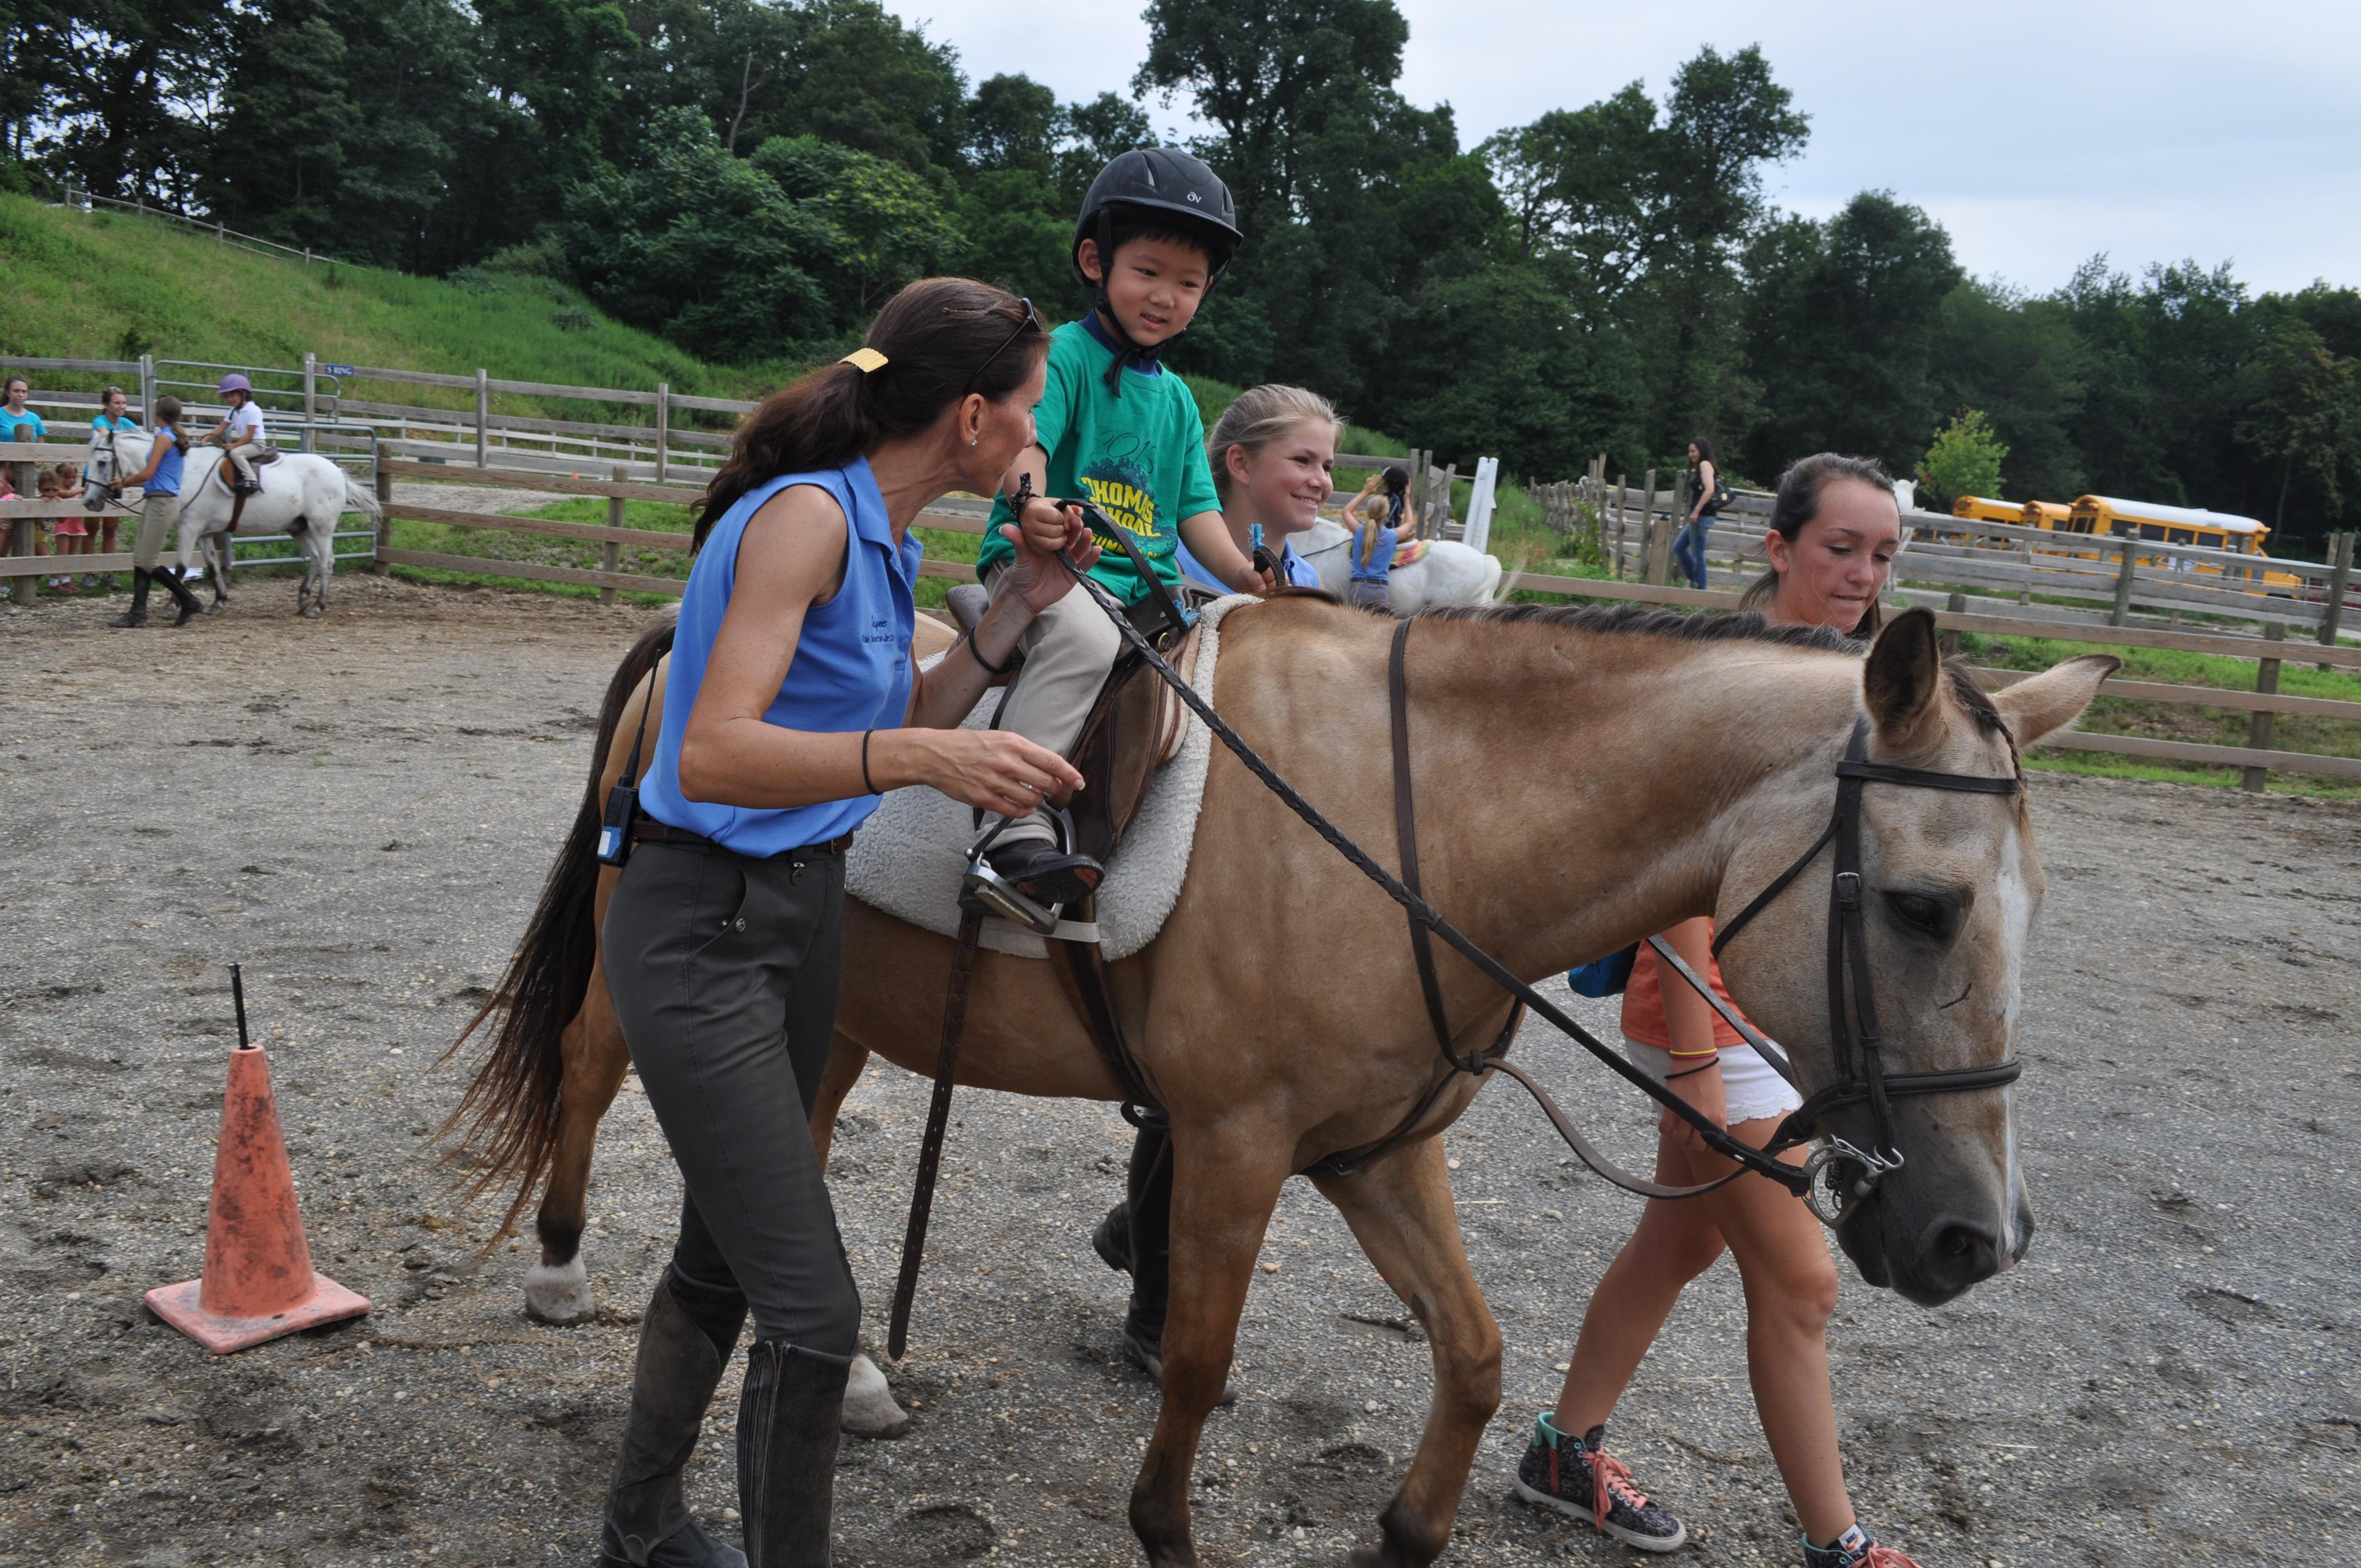 Thomas School of Horsemanship Summer Day Camp & Riding School image 3